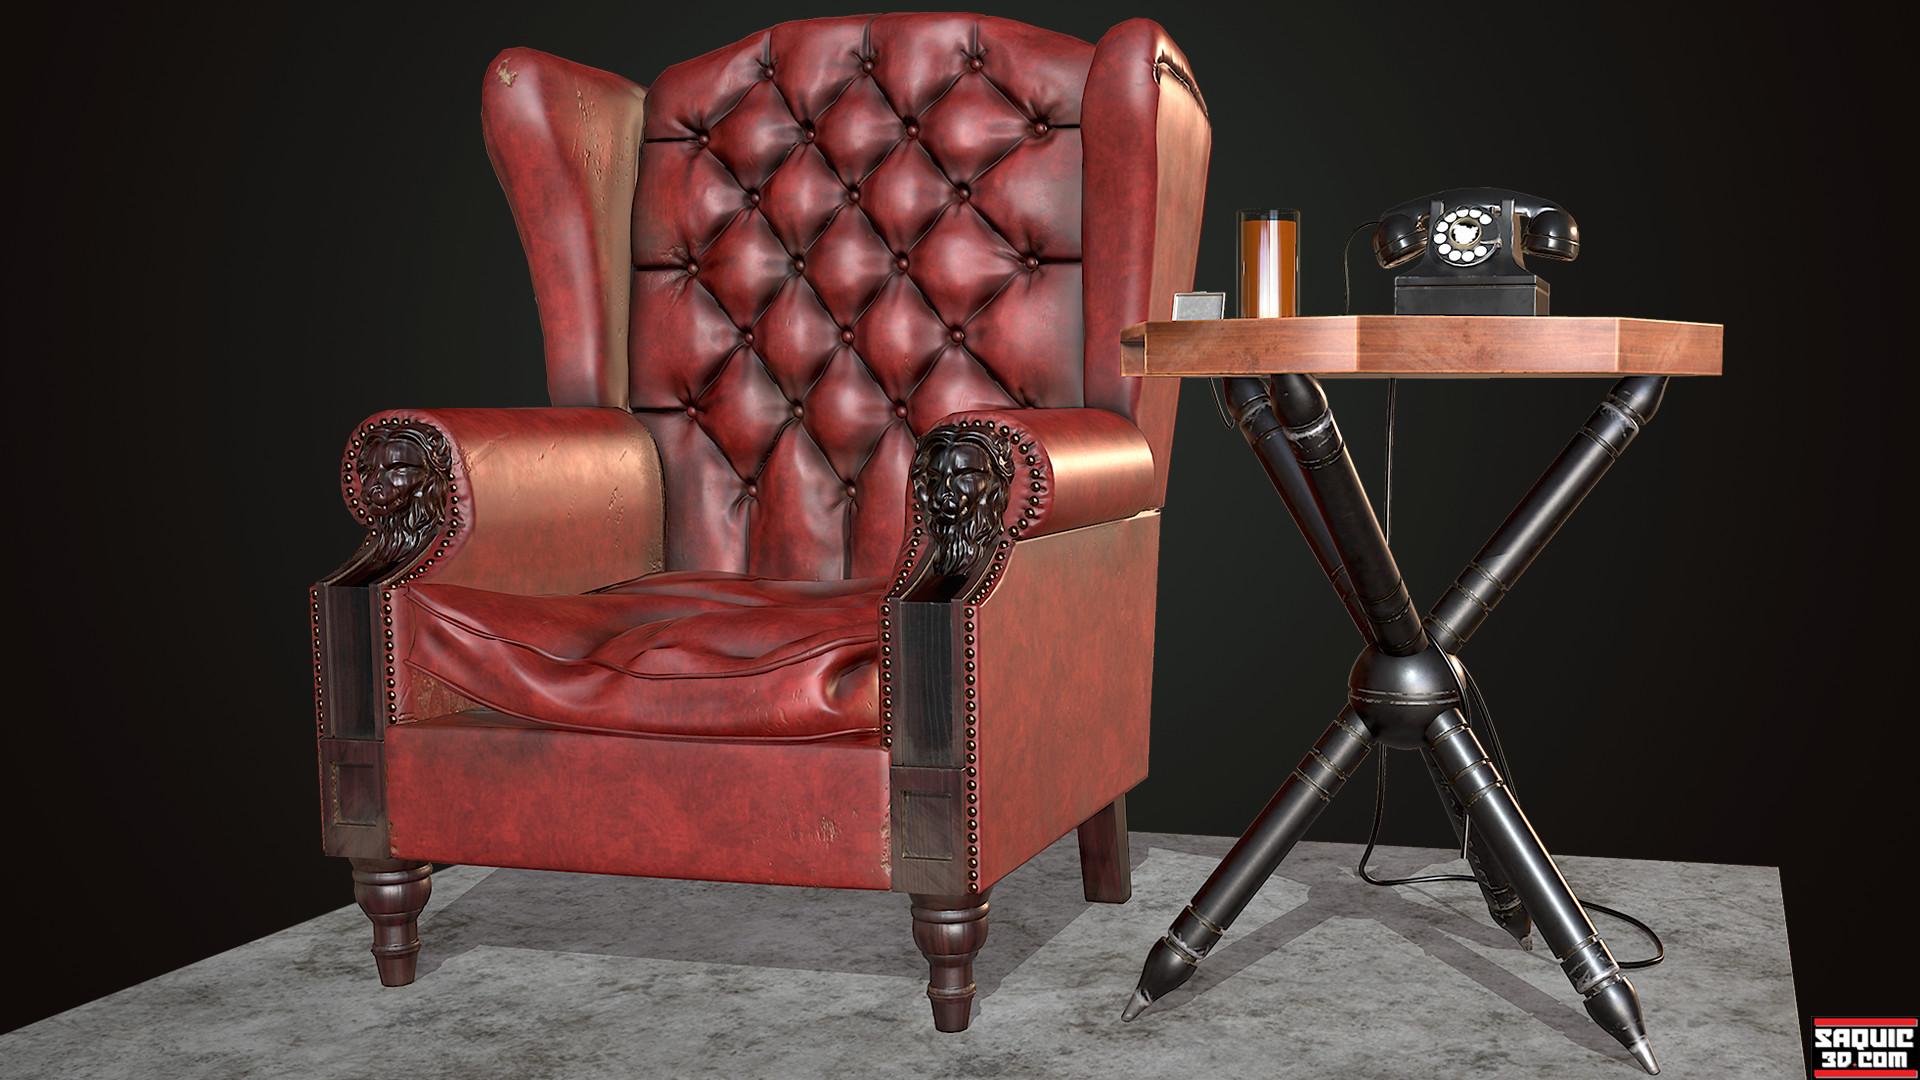 MORPHEUS CHAIR & ArtStation - Morpheus Chair Rene Saquic